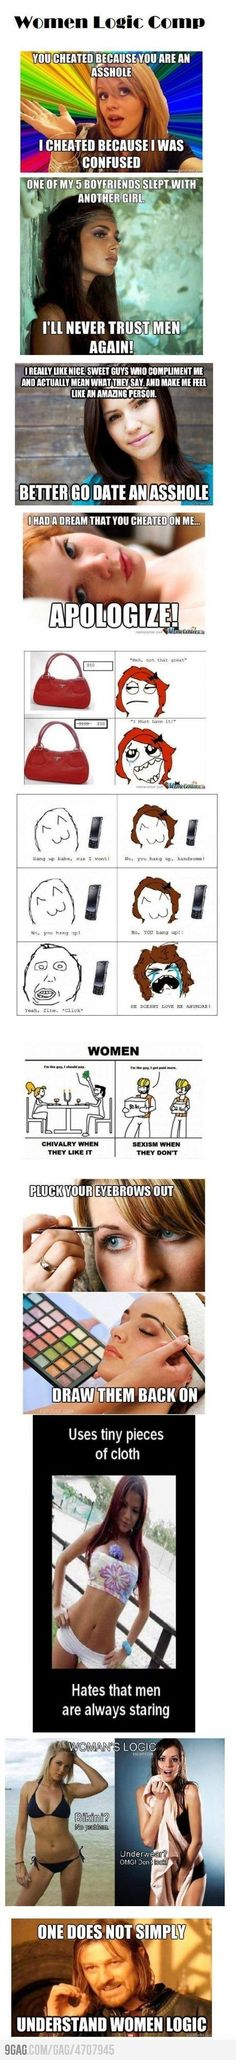 Women's logic...sadly true...